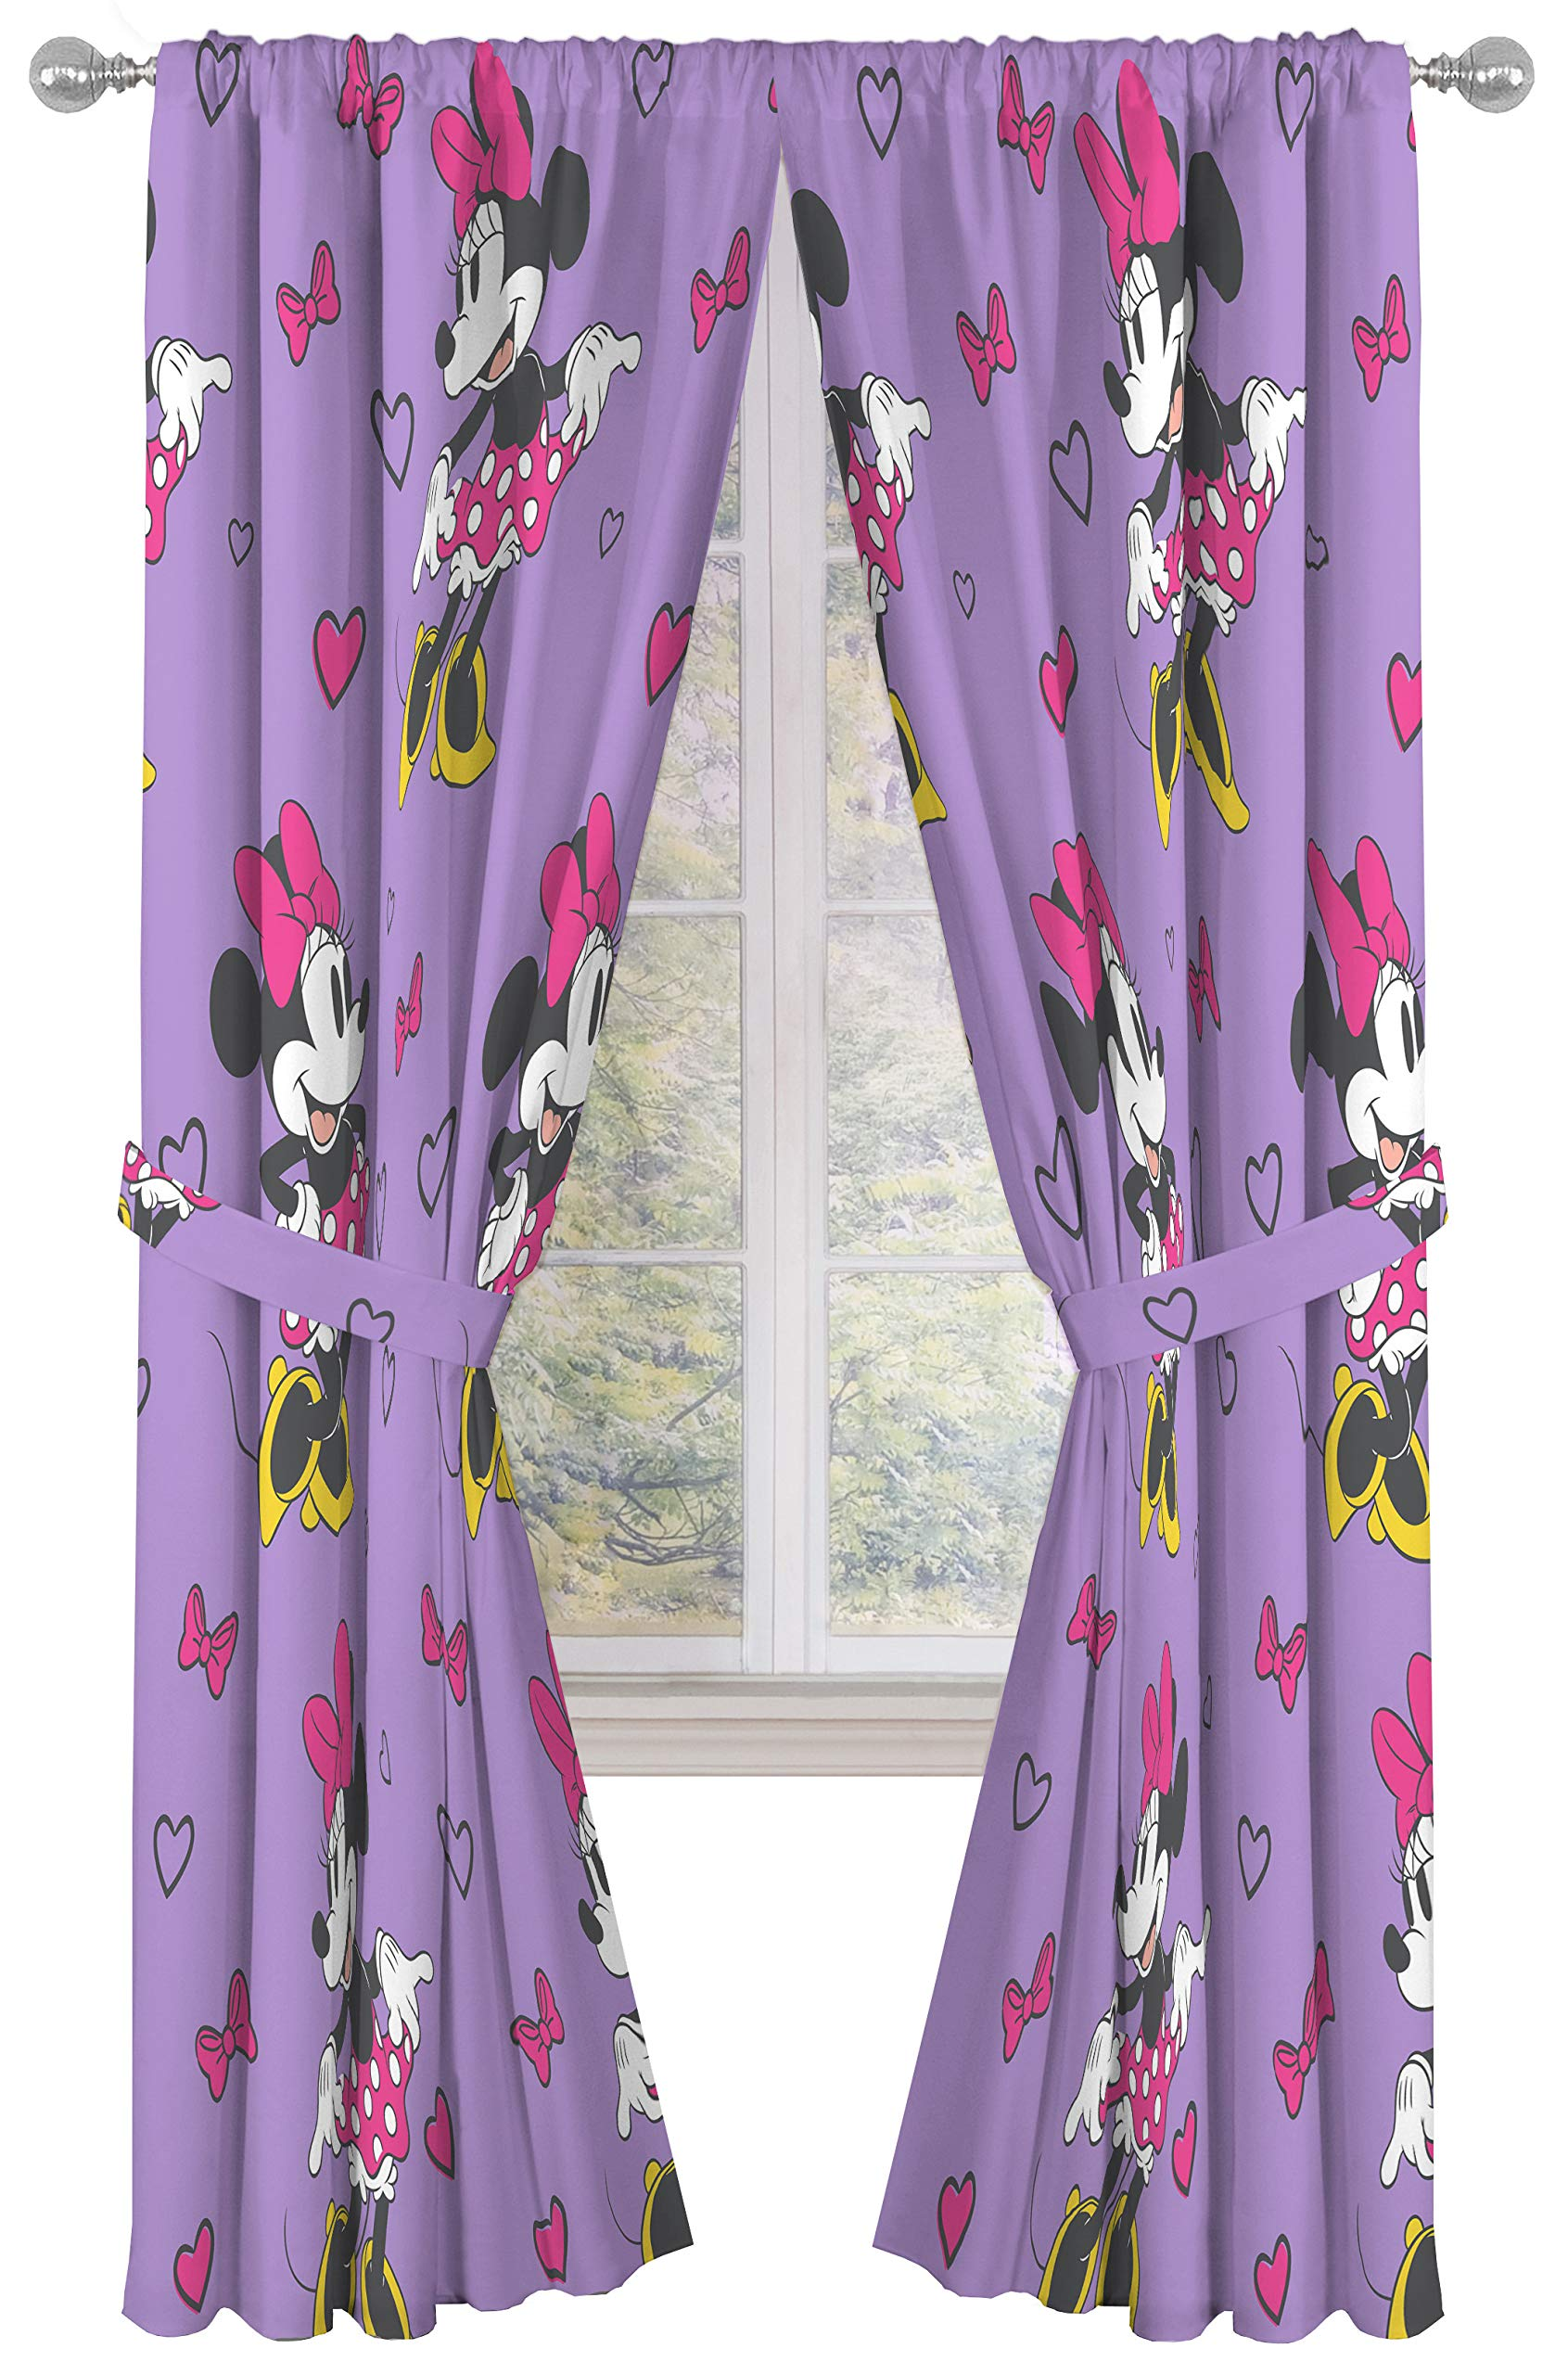 "Disney Minnie Mouse Window Panels Curtains Drapes Pink Bow-tique 42/"" x 63/"" each"